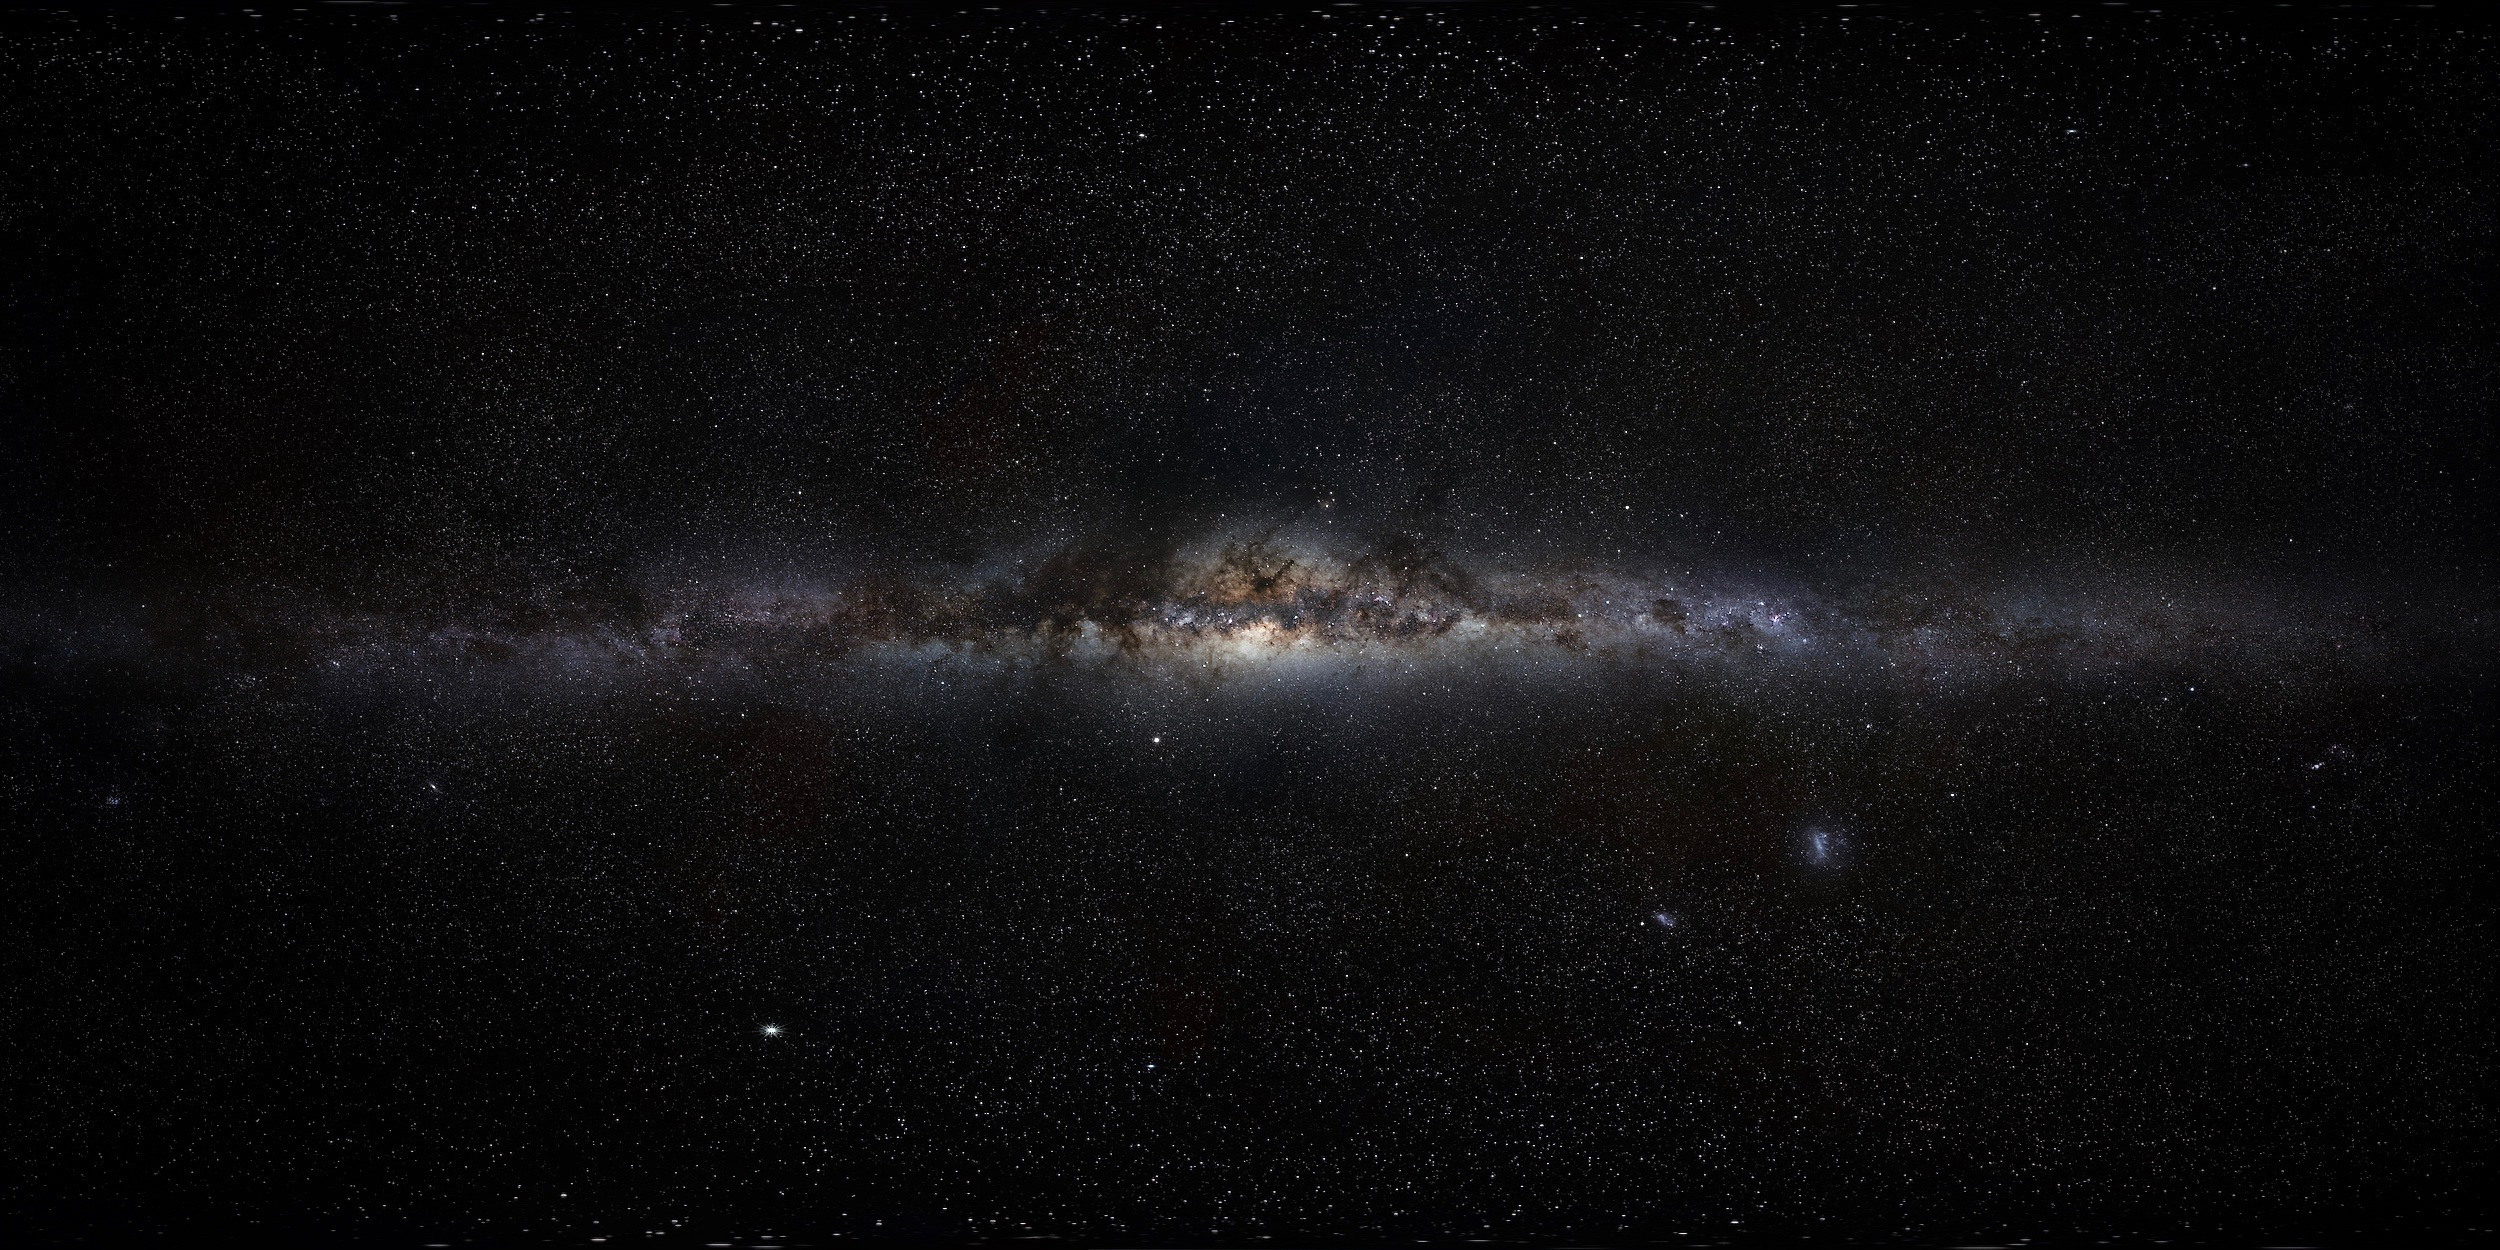 Stromausfall, Milchstraße, Galaxie, Galaxy, Milky Way, Berlin, Nacht, Stromausfall, CREDIT ESO/S. Brunier/CC-BY 4.0 (1).jpg